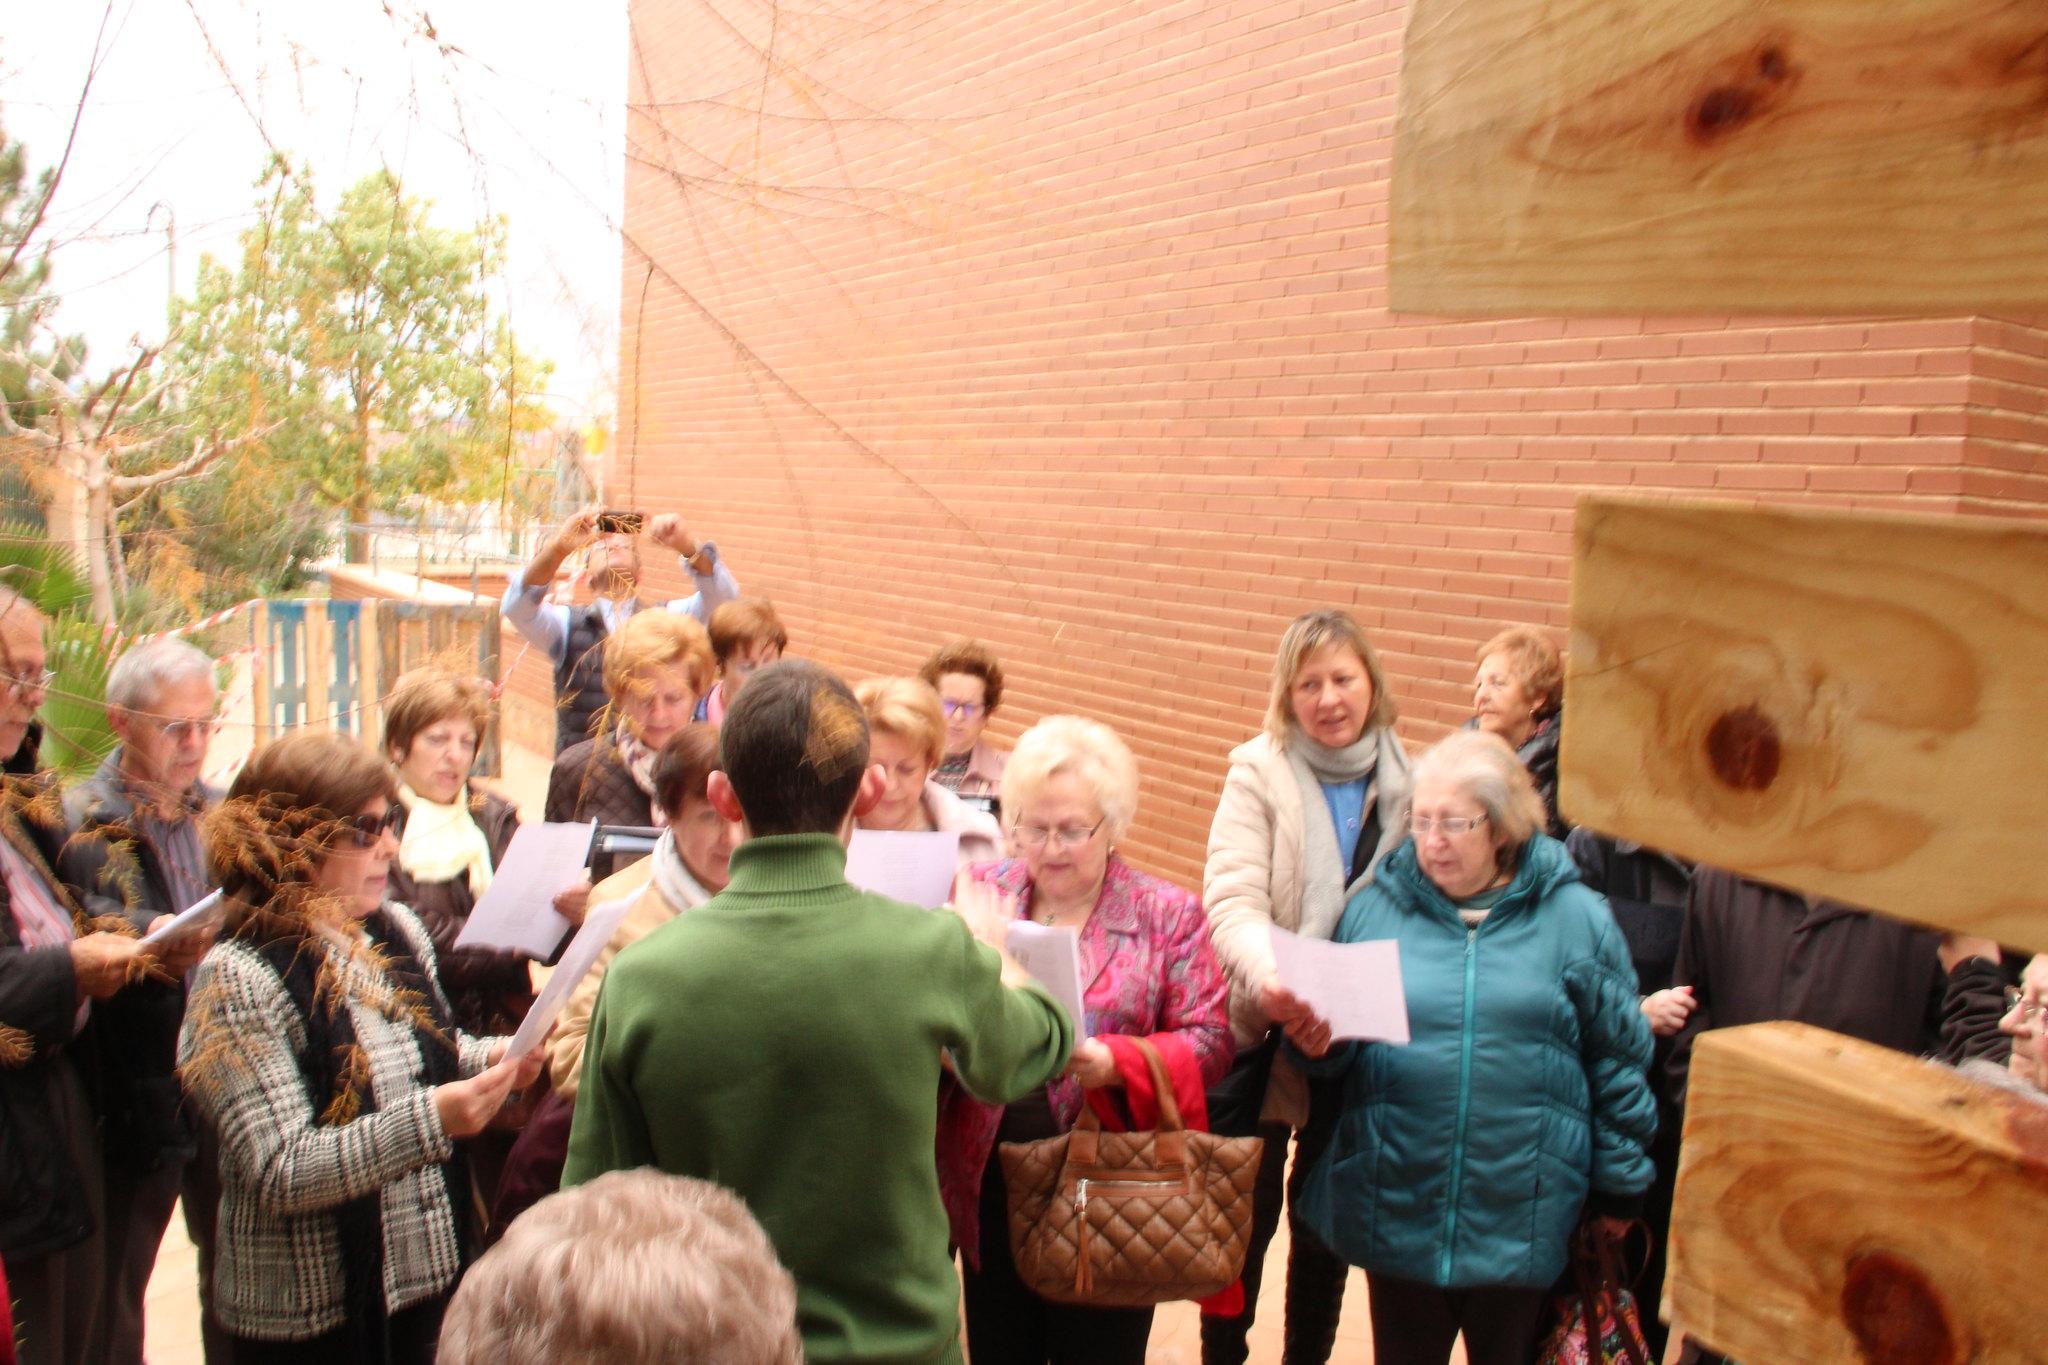 (2016-02-13) - Inauguración Virgen De Lourdes, La Molineta - Archivo La Molineta (093)